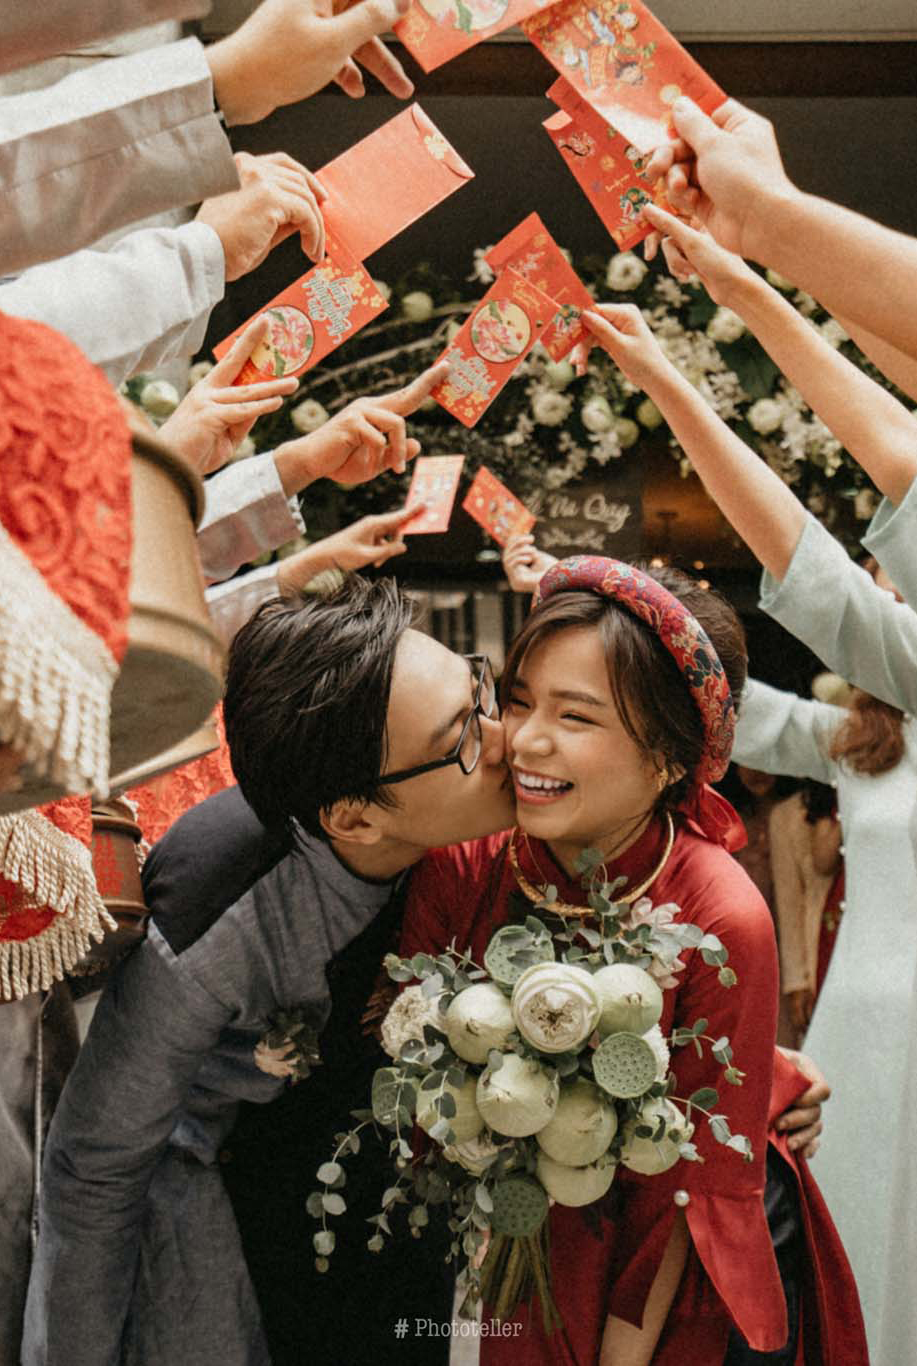 Tùng & Thanh wedding journalism